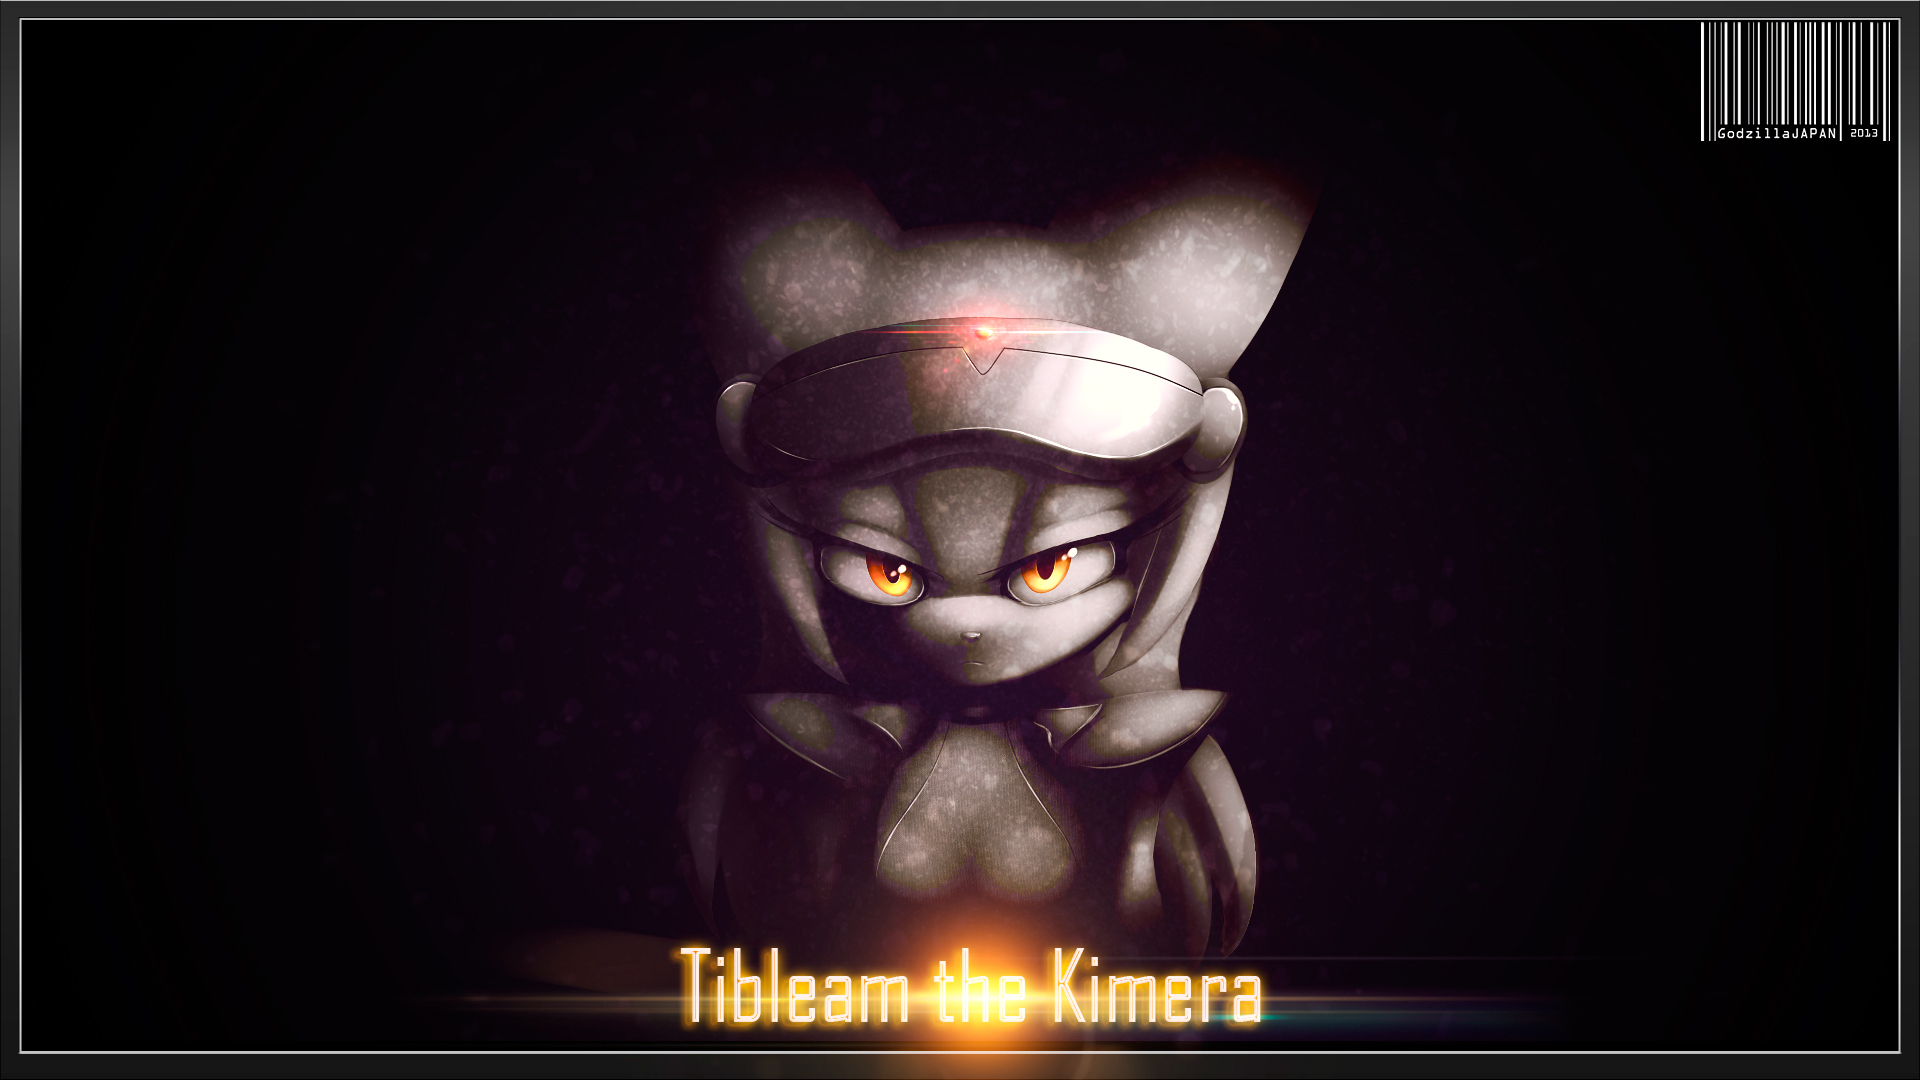 GIFT: TIBLEAM THE KIMERA by GodzillaJAPAN